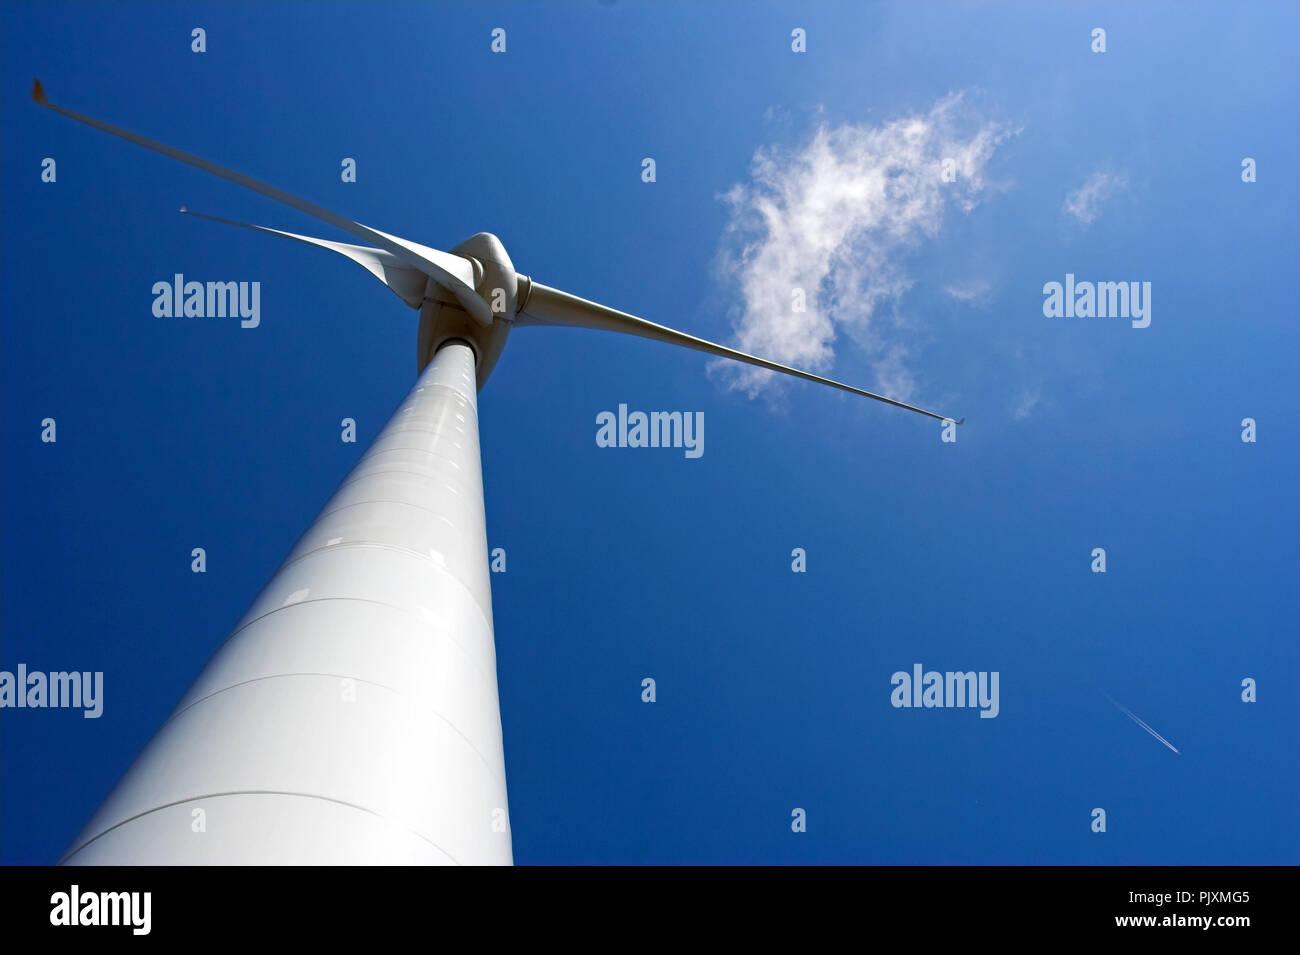 Andere Perspektive eines Wind Generator gegen deep blue sky Stockbild